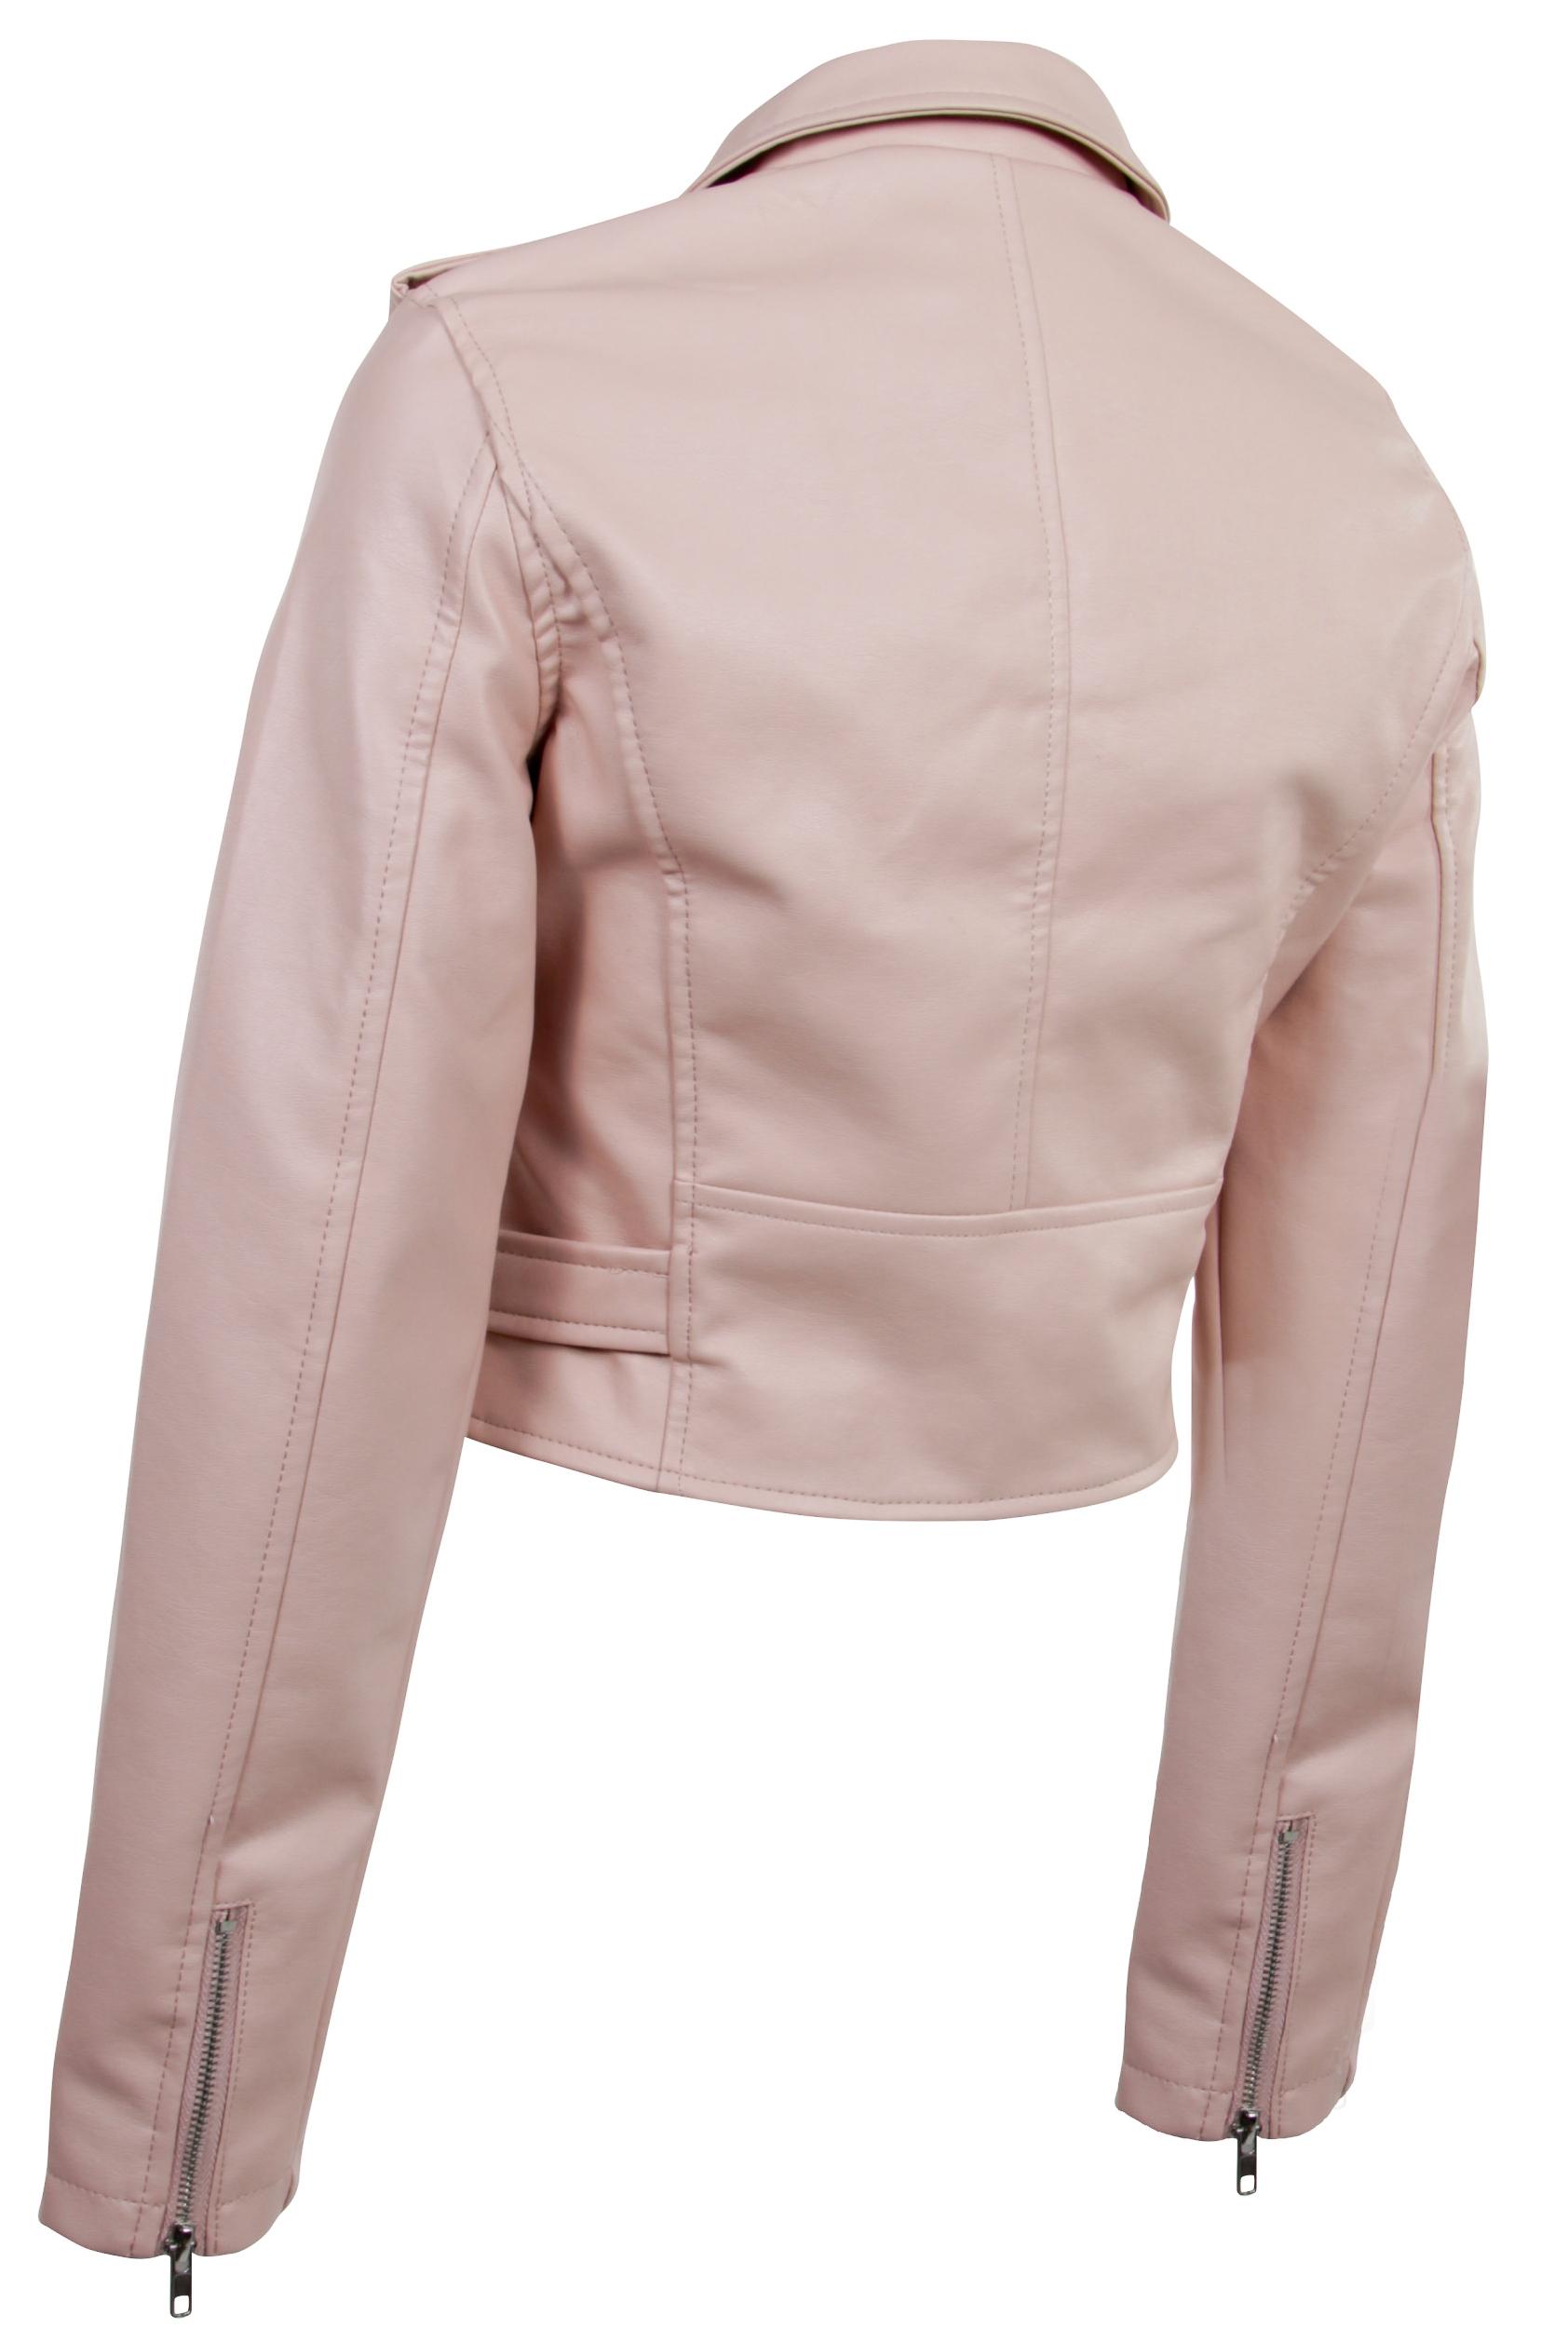 Women-039-s-Juniors-Fashionable-Cropped-Faux-Leather-Moto-Biker-Jacket thumbnail 16